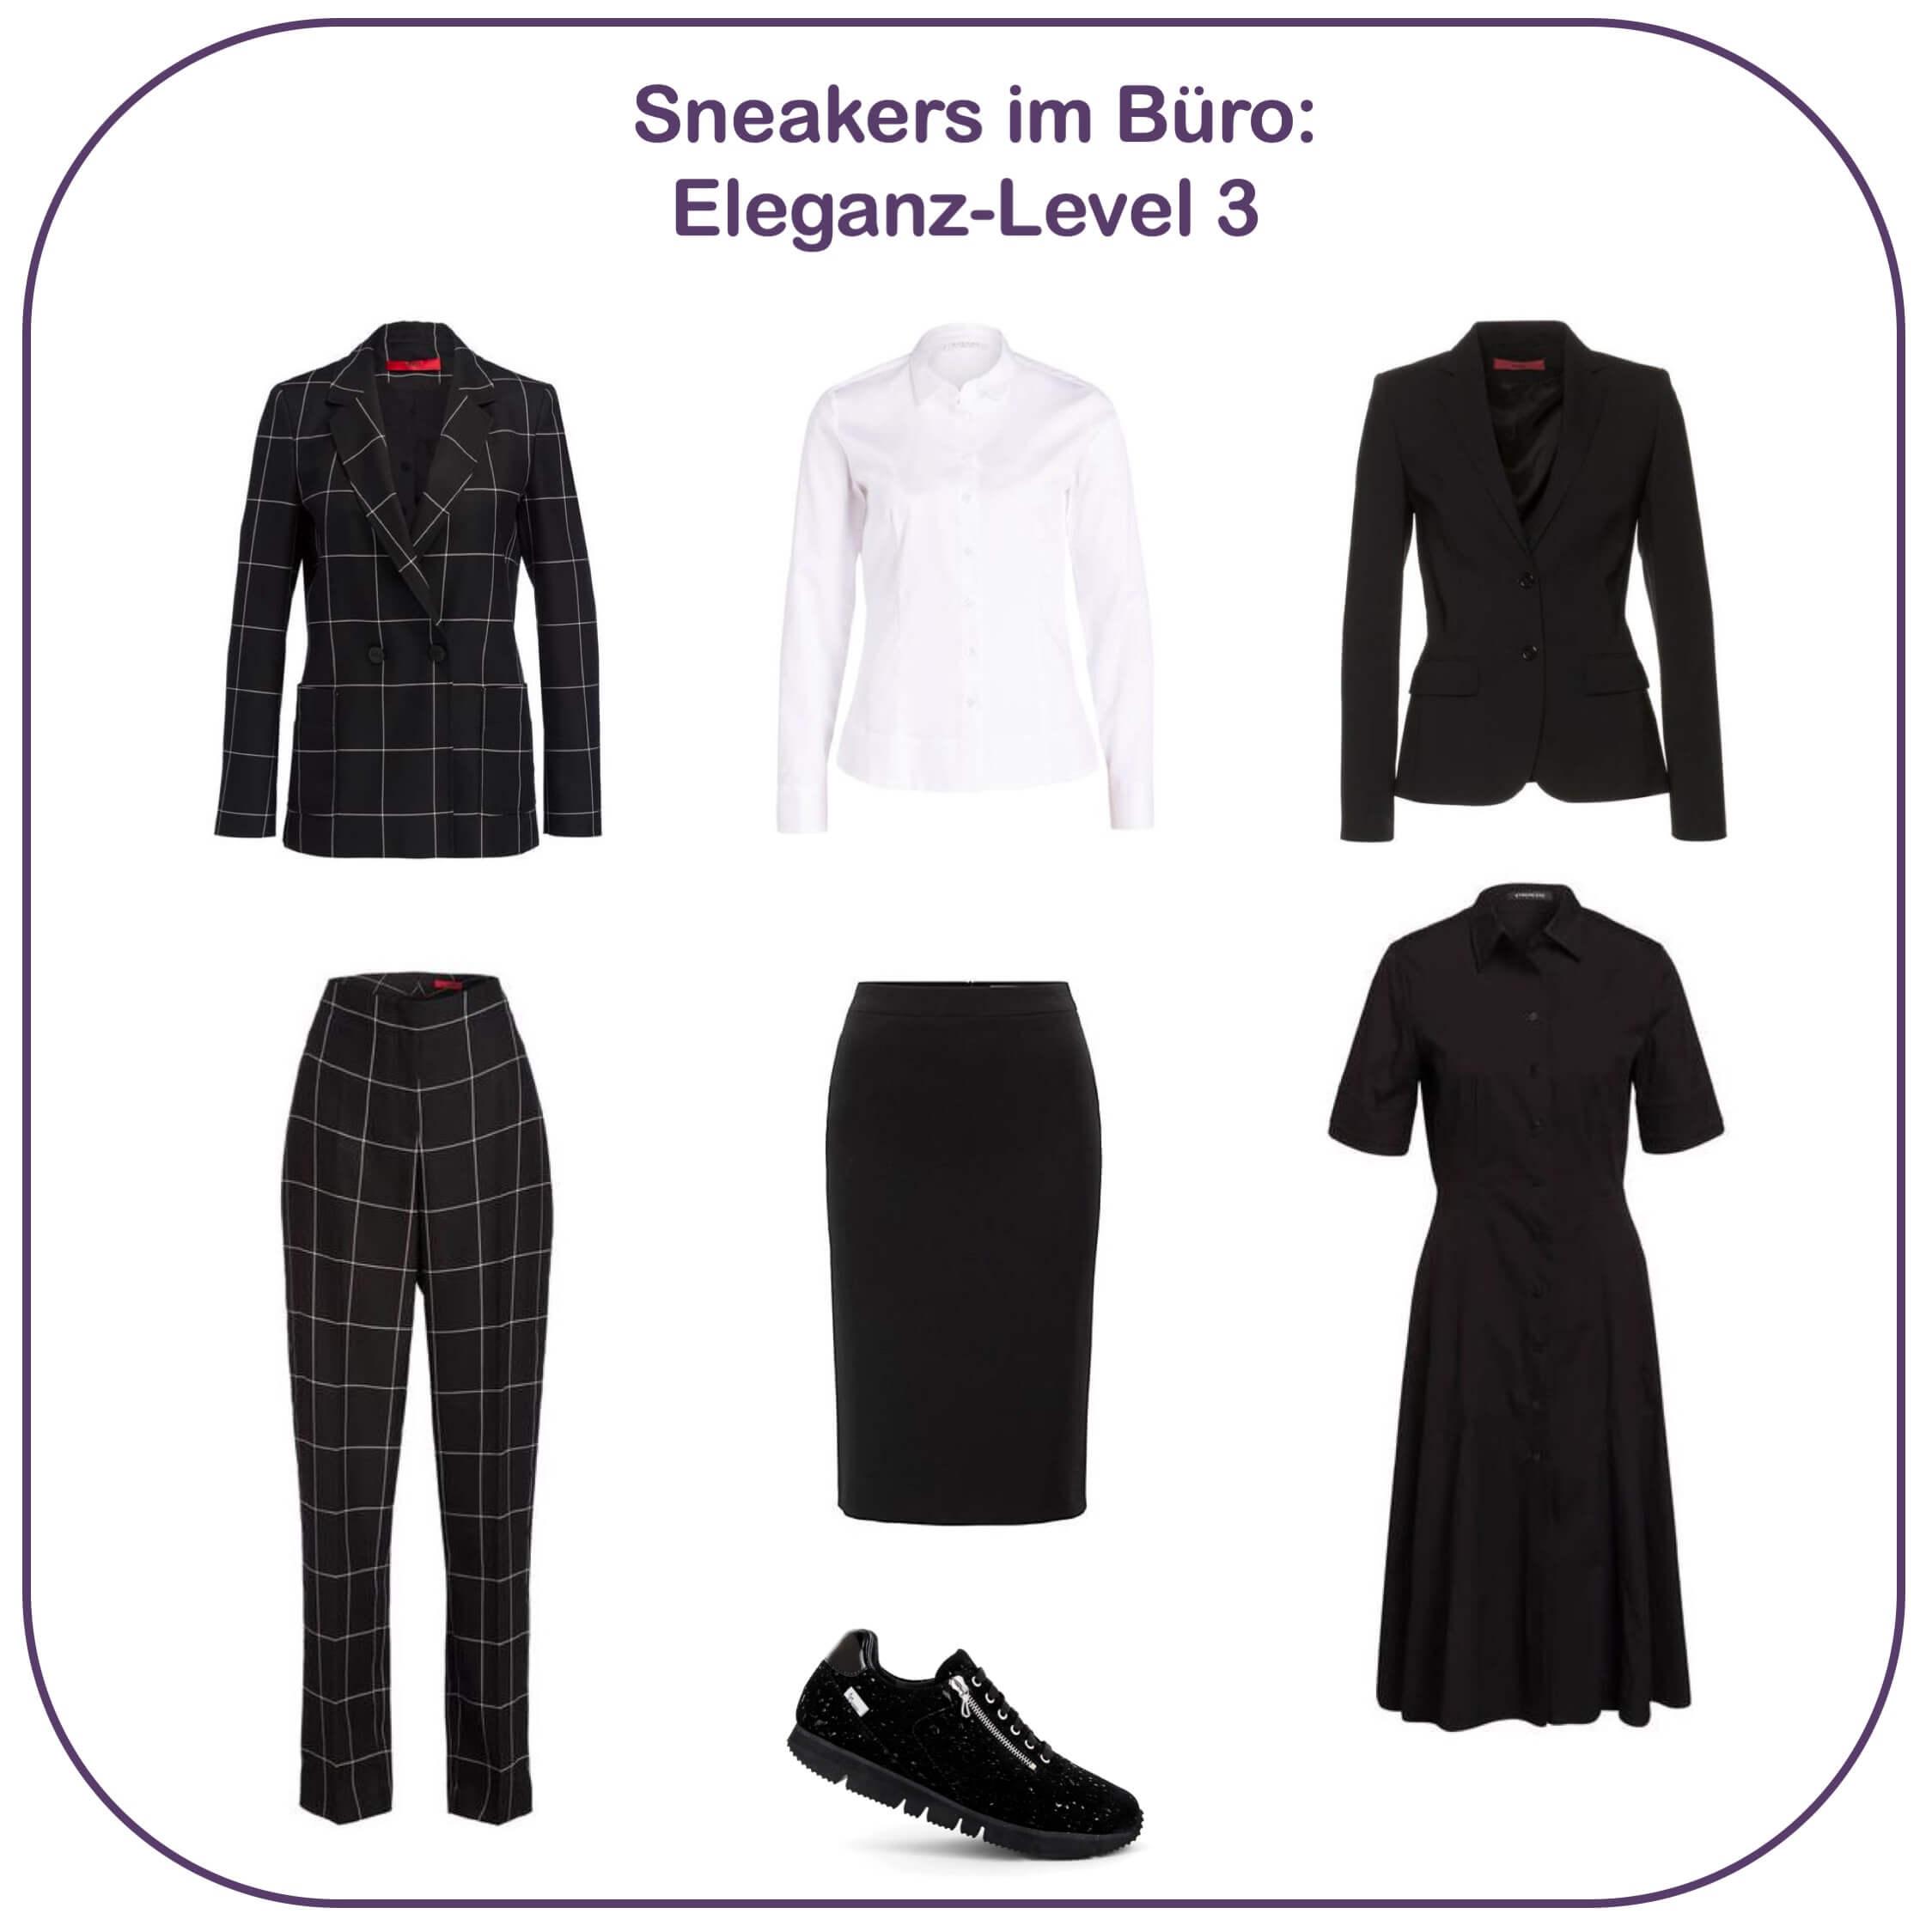 Sneakers im Büro - Eleganz-Level 3